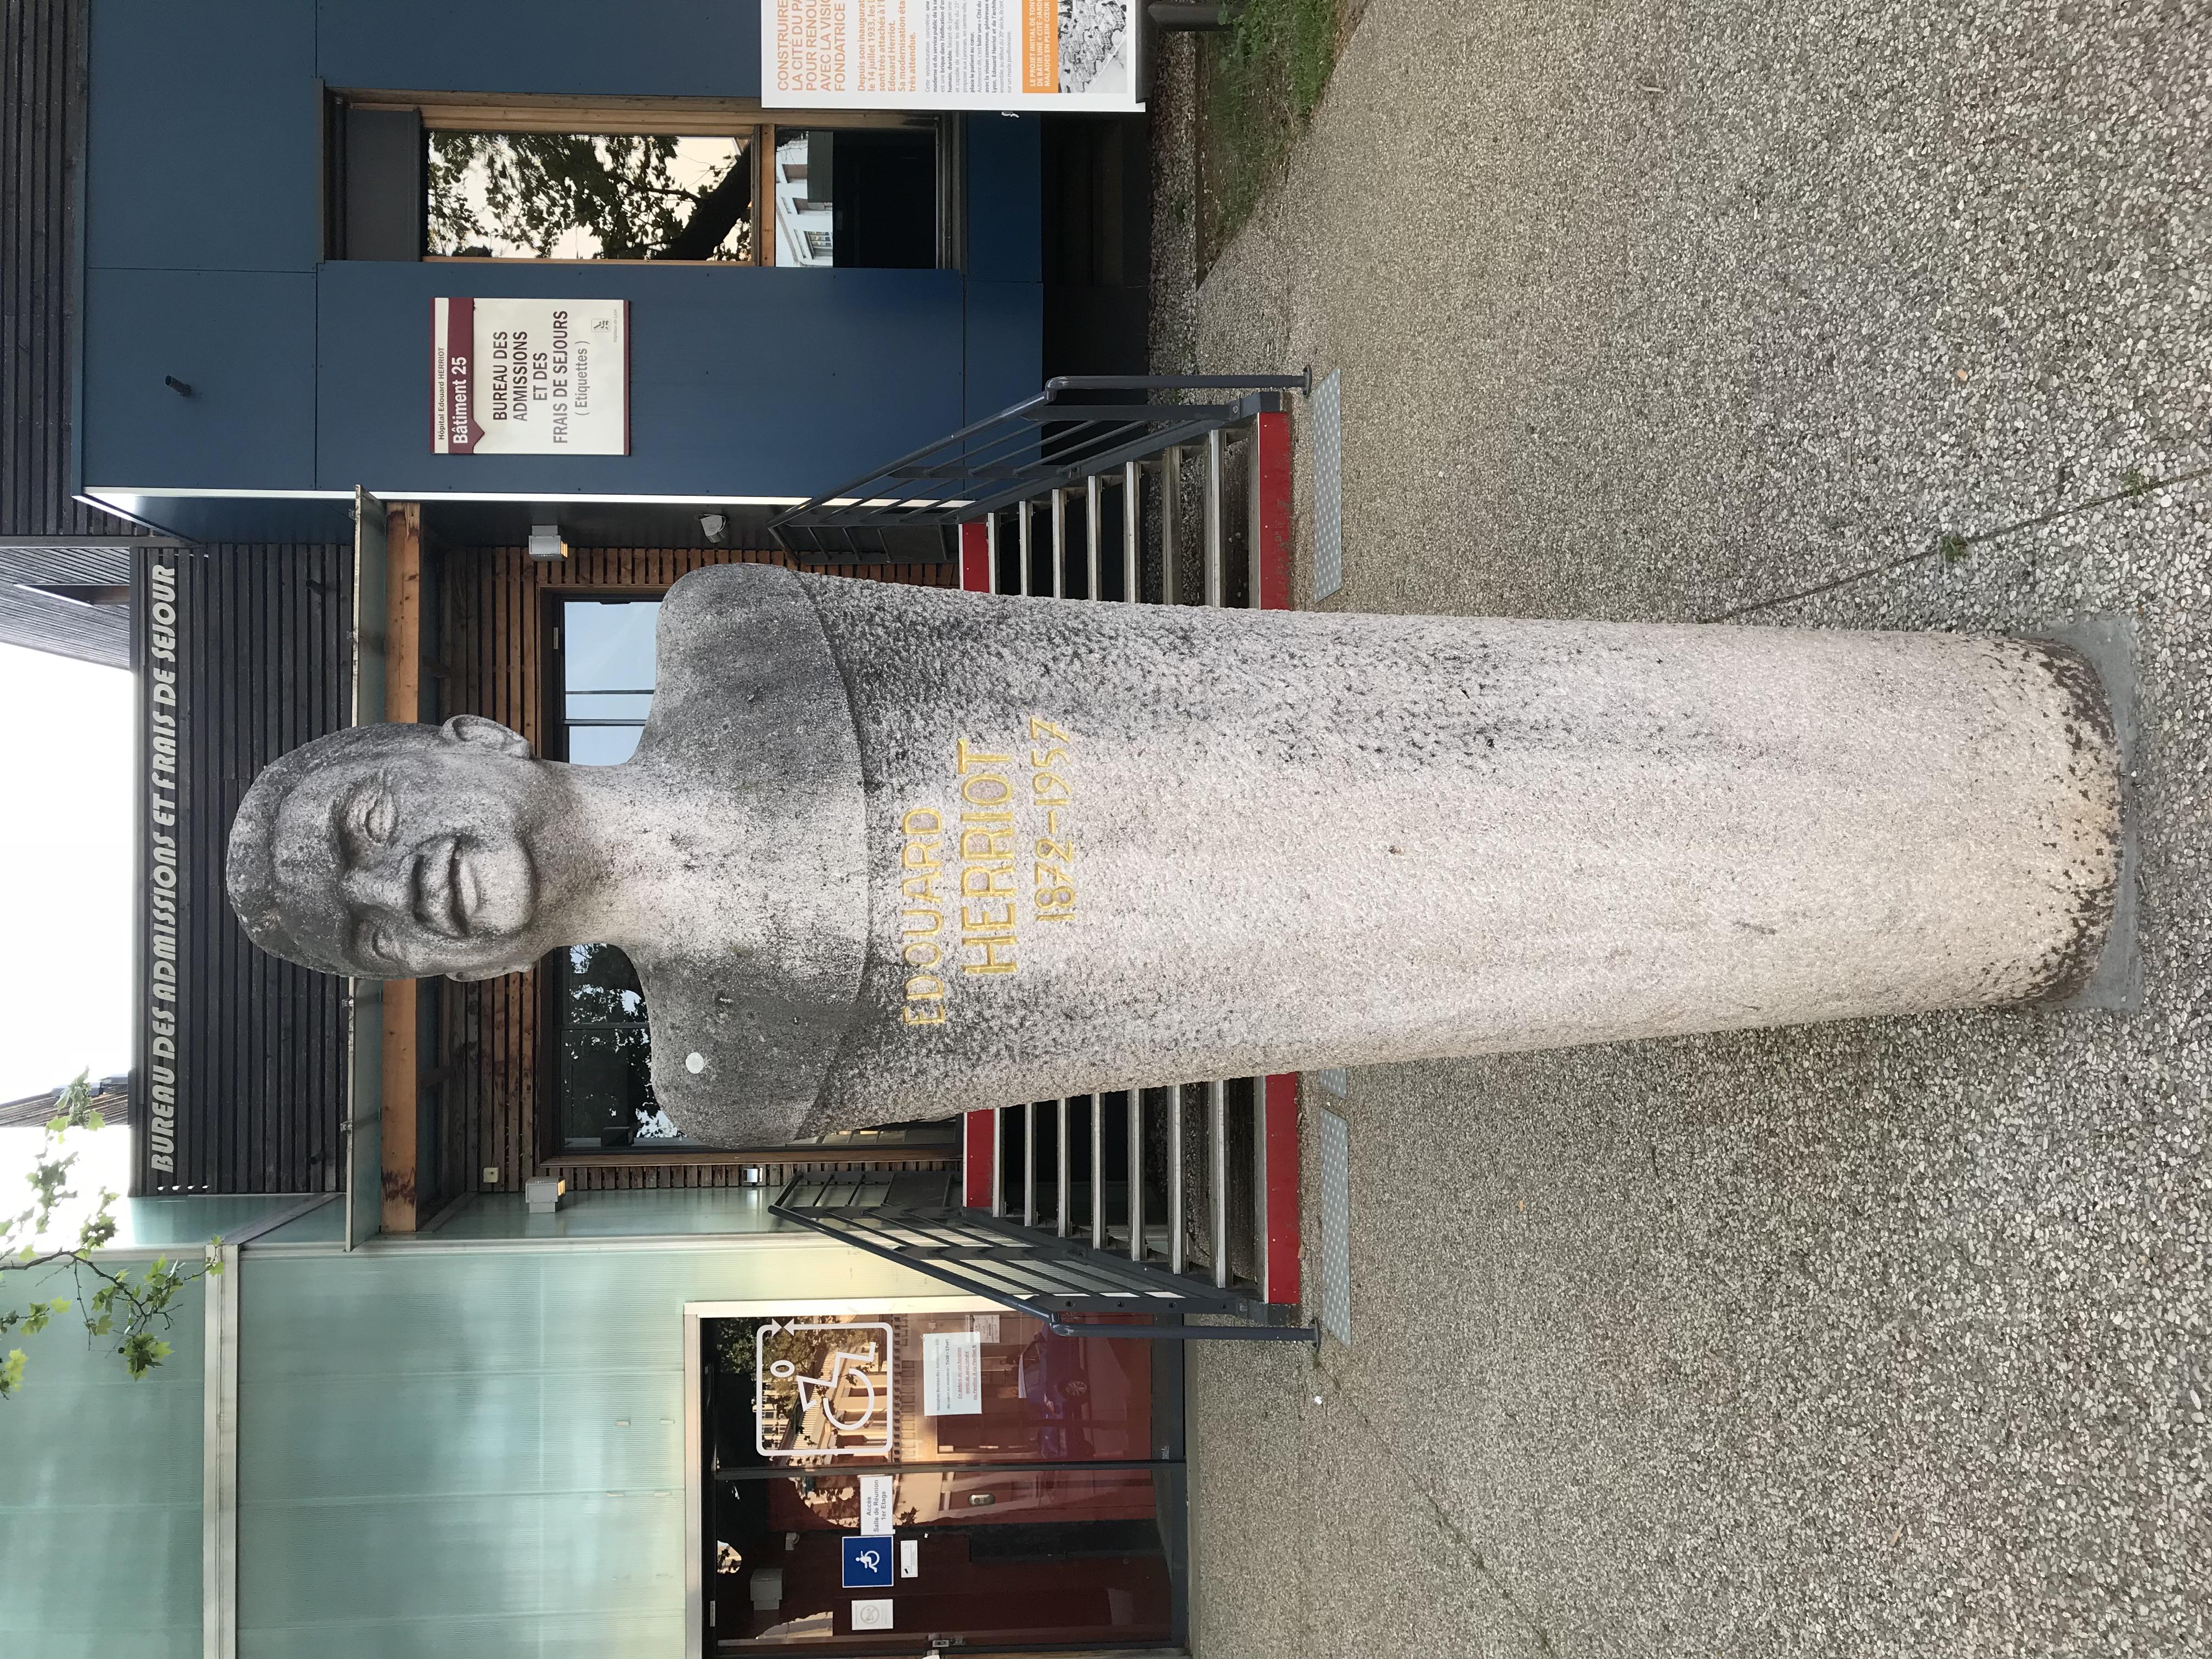 File:hôpital Édouard herriot lyon buste dÉdouard herriot 1.jpg